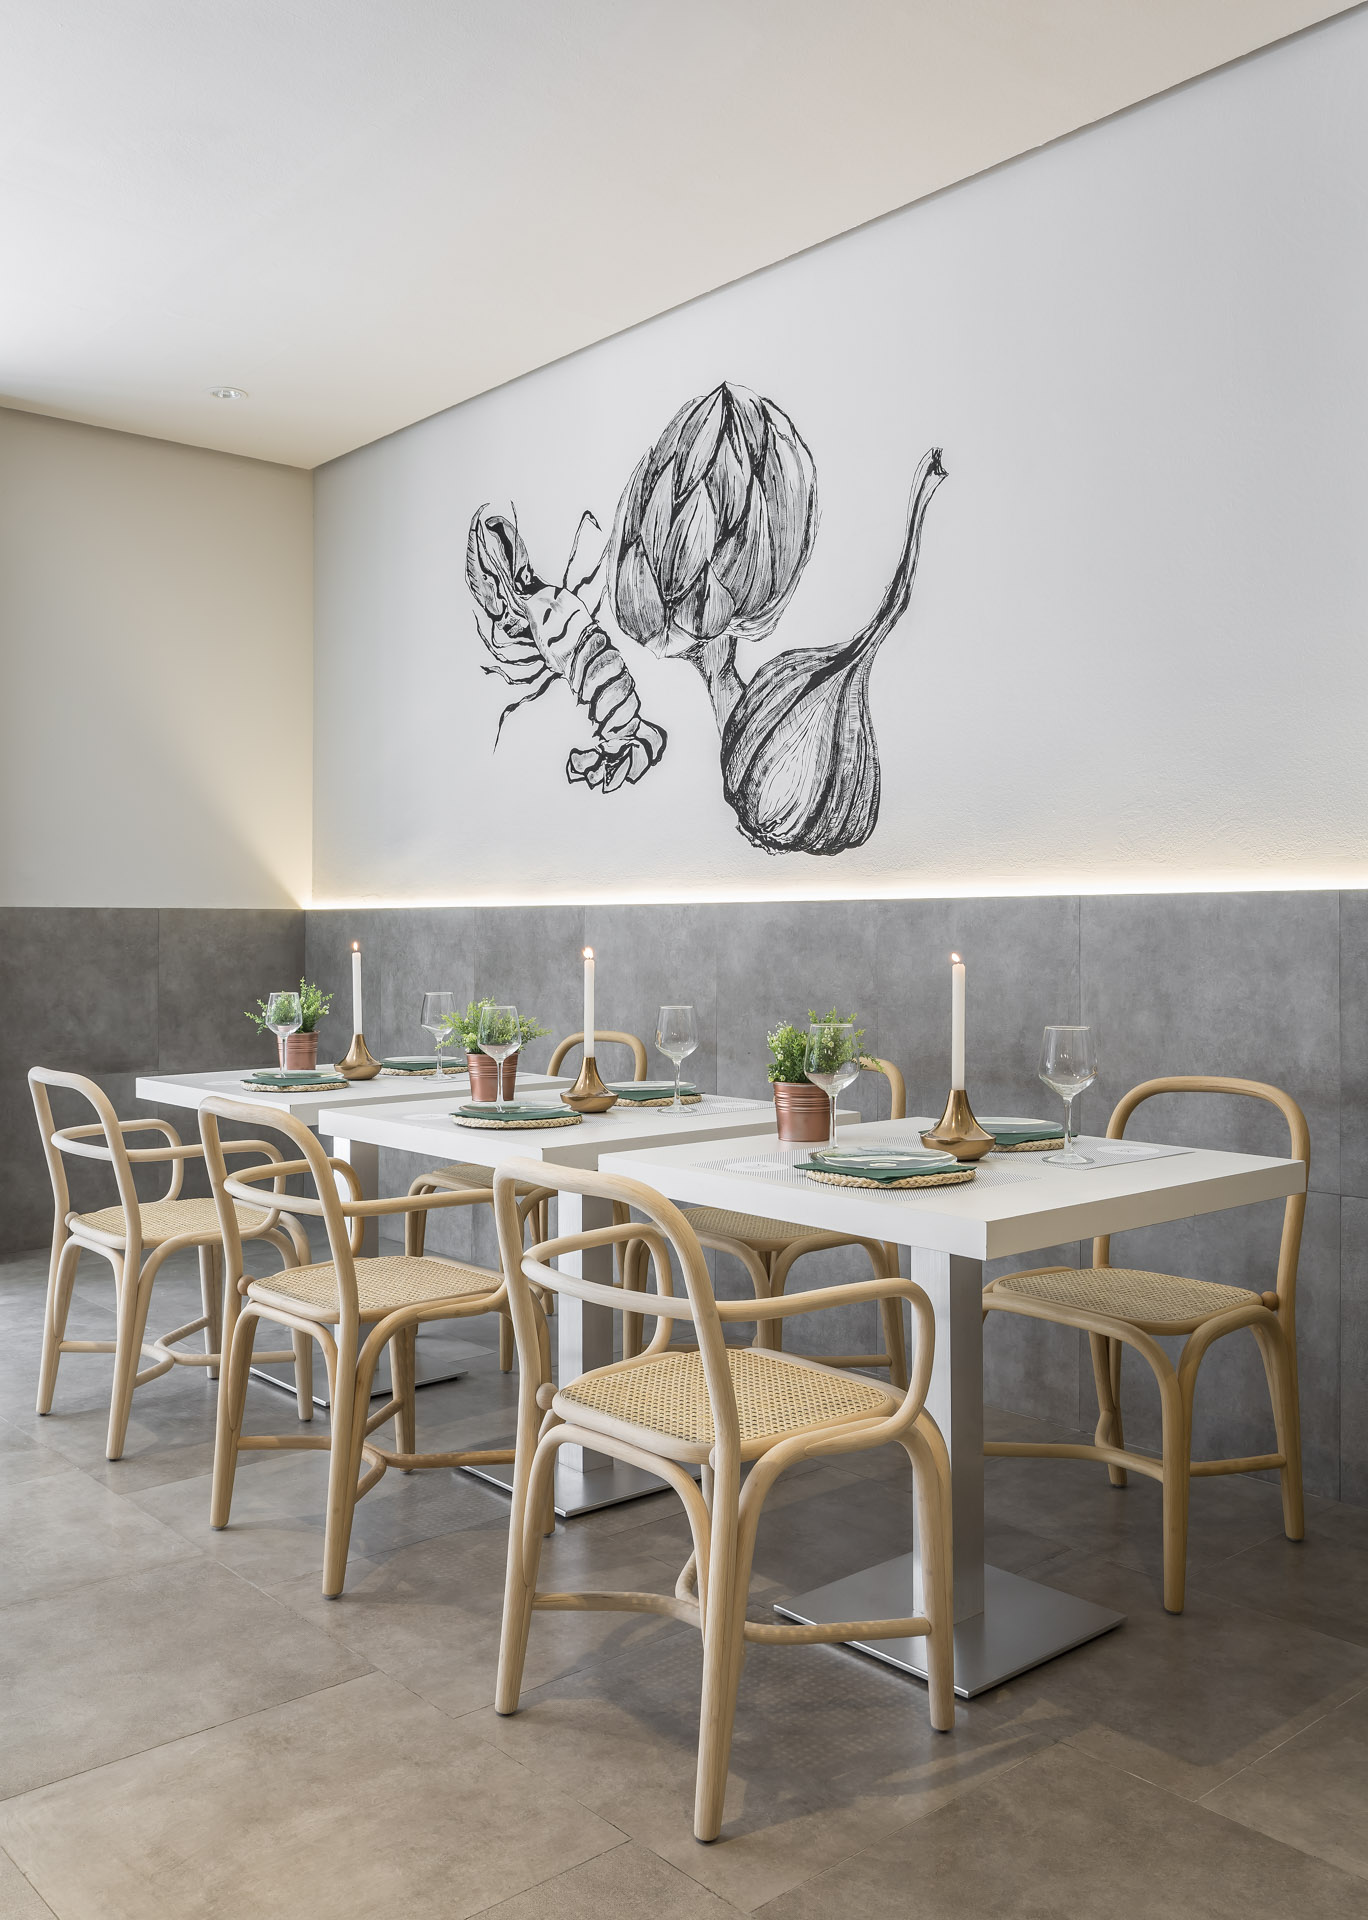 fotografia-arquitectura-valencia-german-cabo-estudihac-restaurante-nac-ontinyent-12